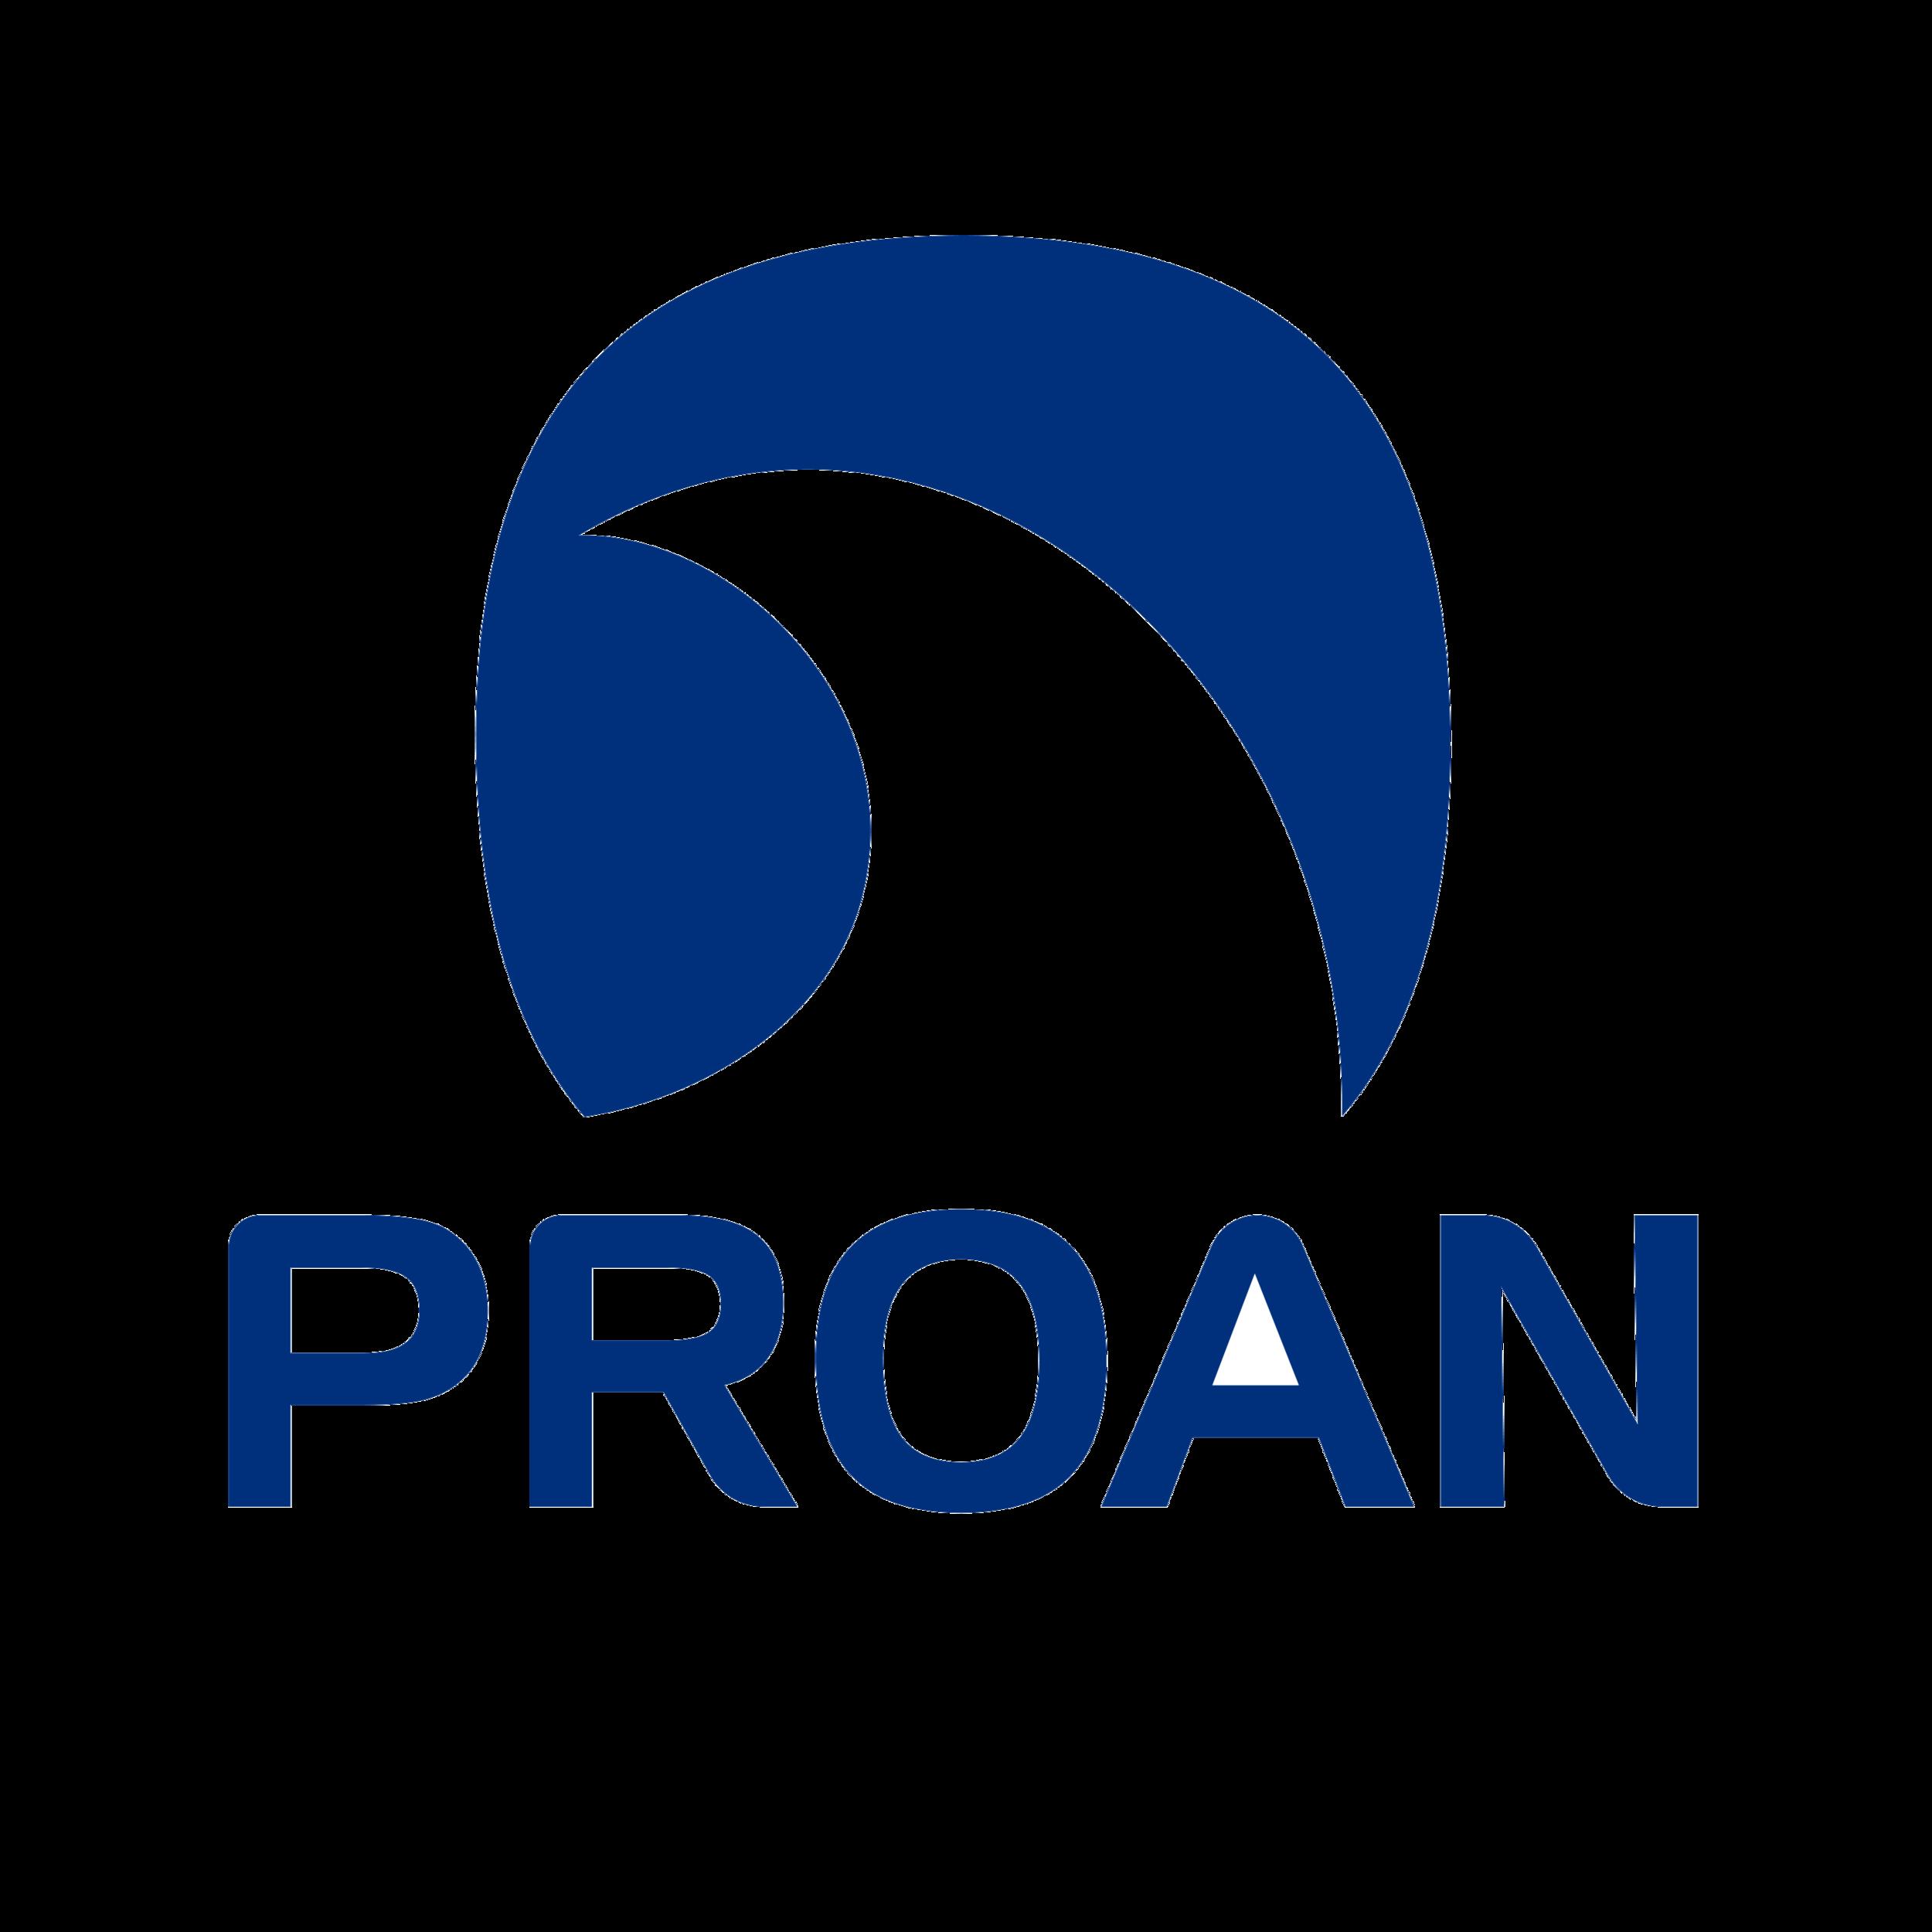 logo_proan.png